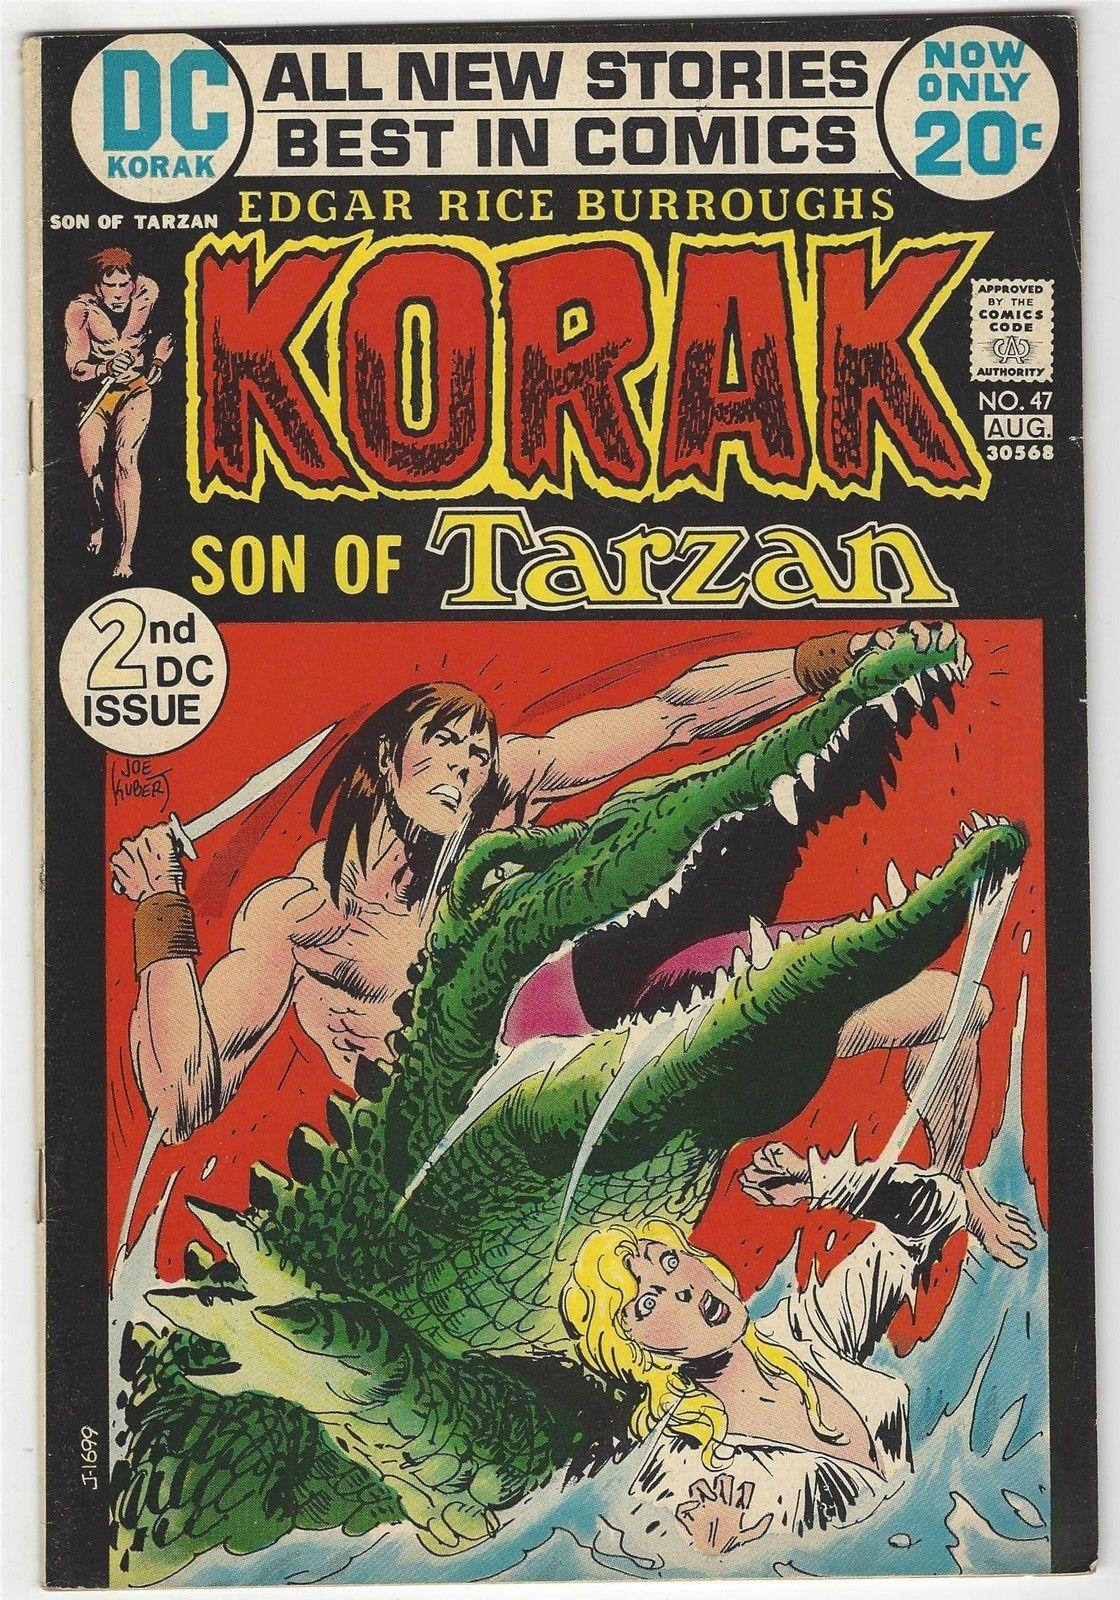 Korak Son of Tarzan # 47